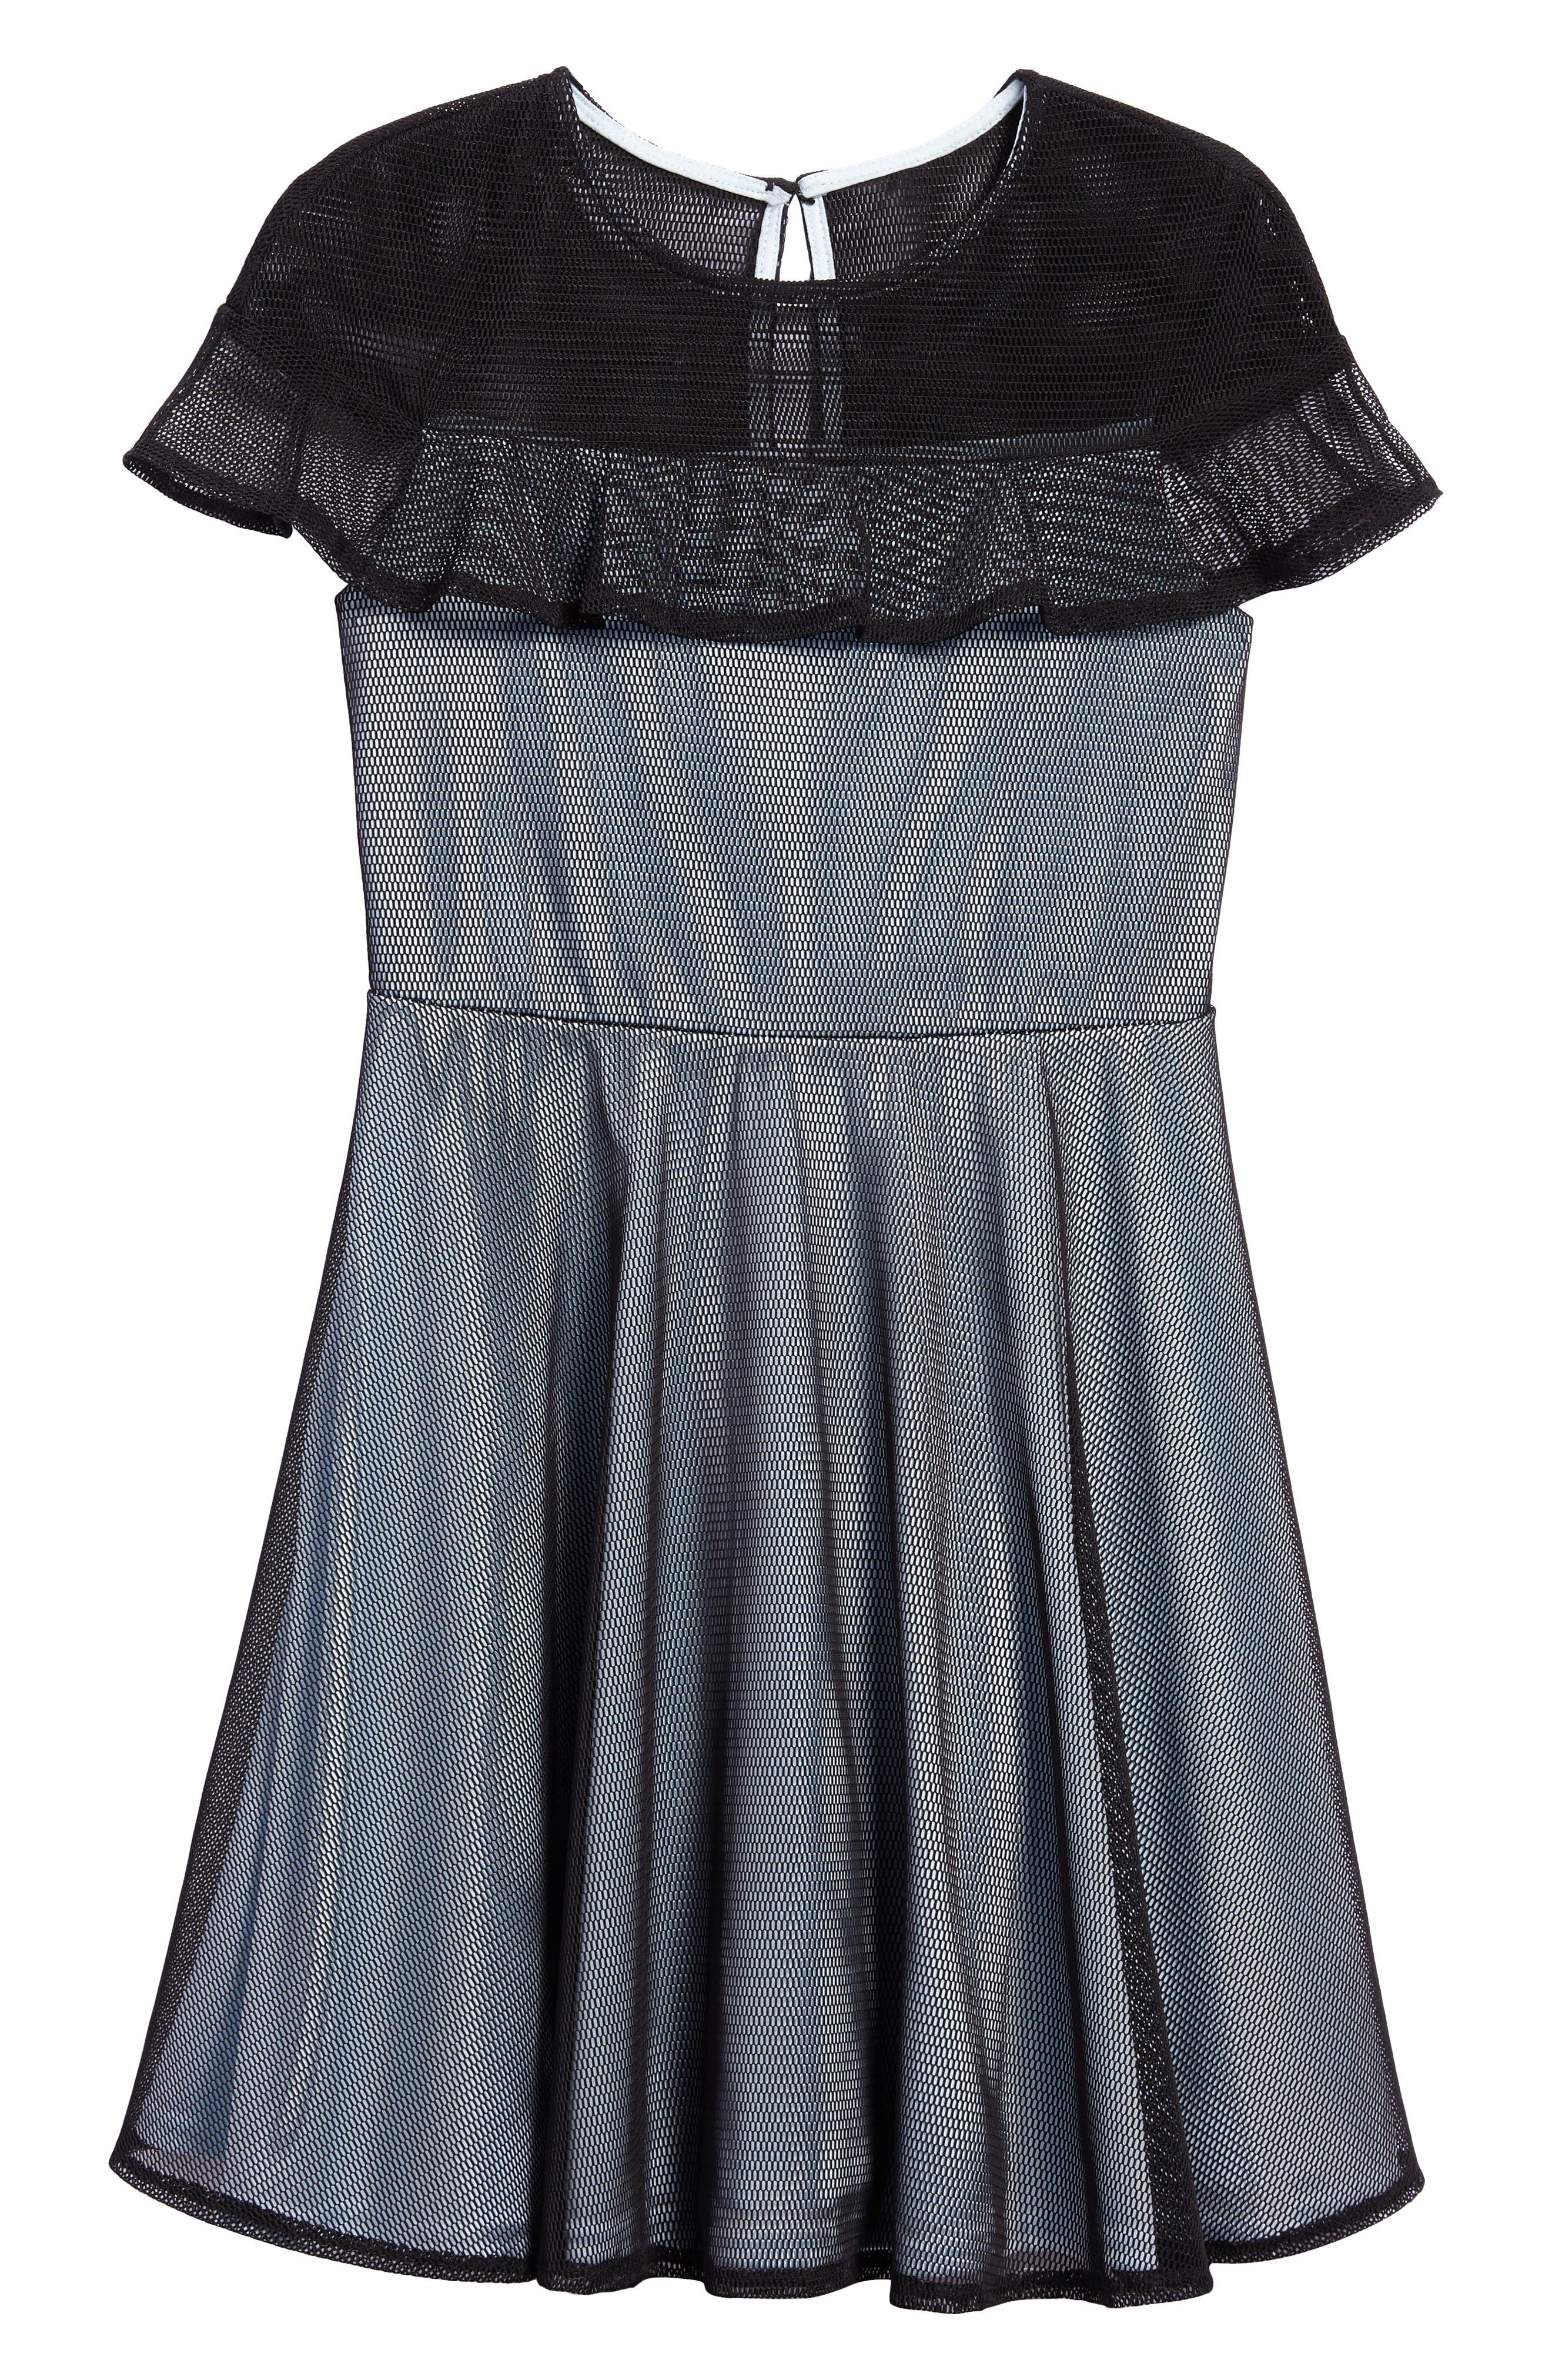 Ruffle Mesh Overlay Dress,                         Main,                         color, Black